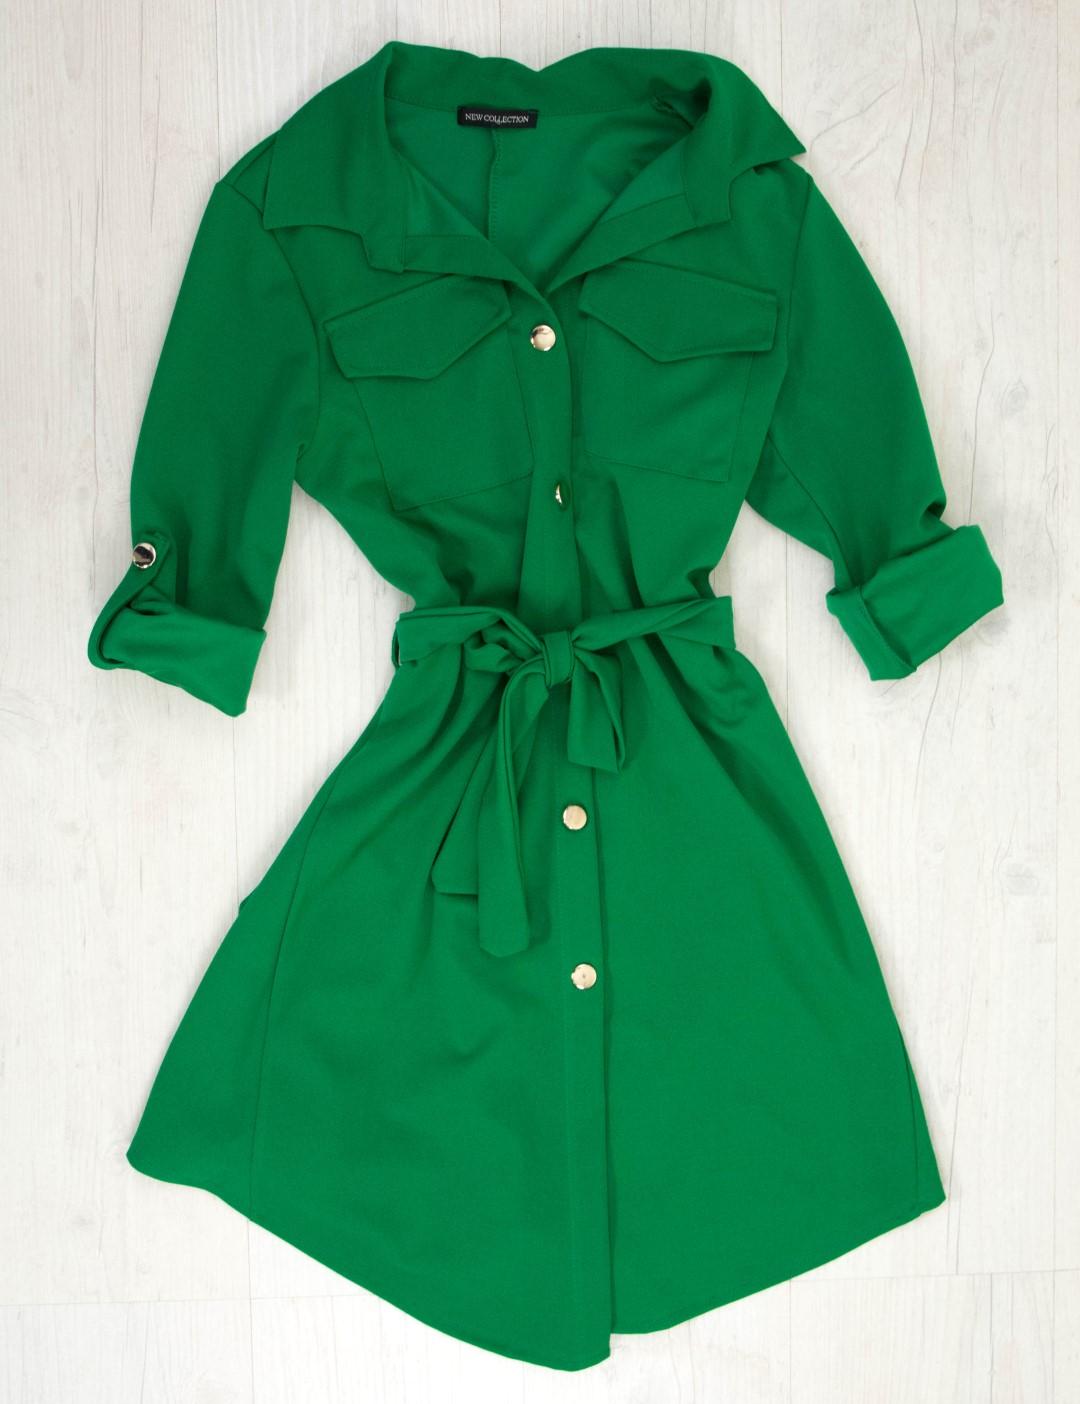 0e207e4dd4fa Γυναικείο πράσινο πουκαμισοφόρεμα με χρυσά κουμπιά 5005Z